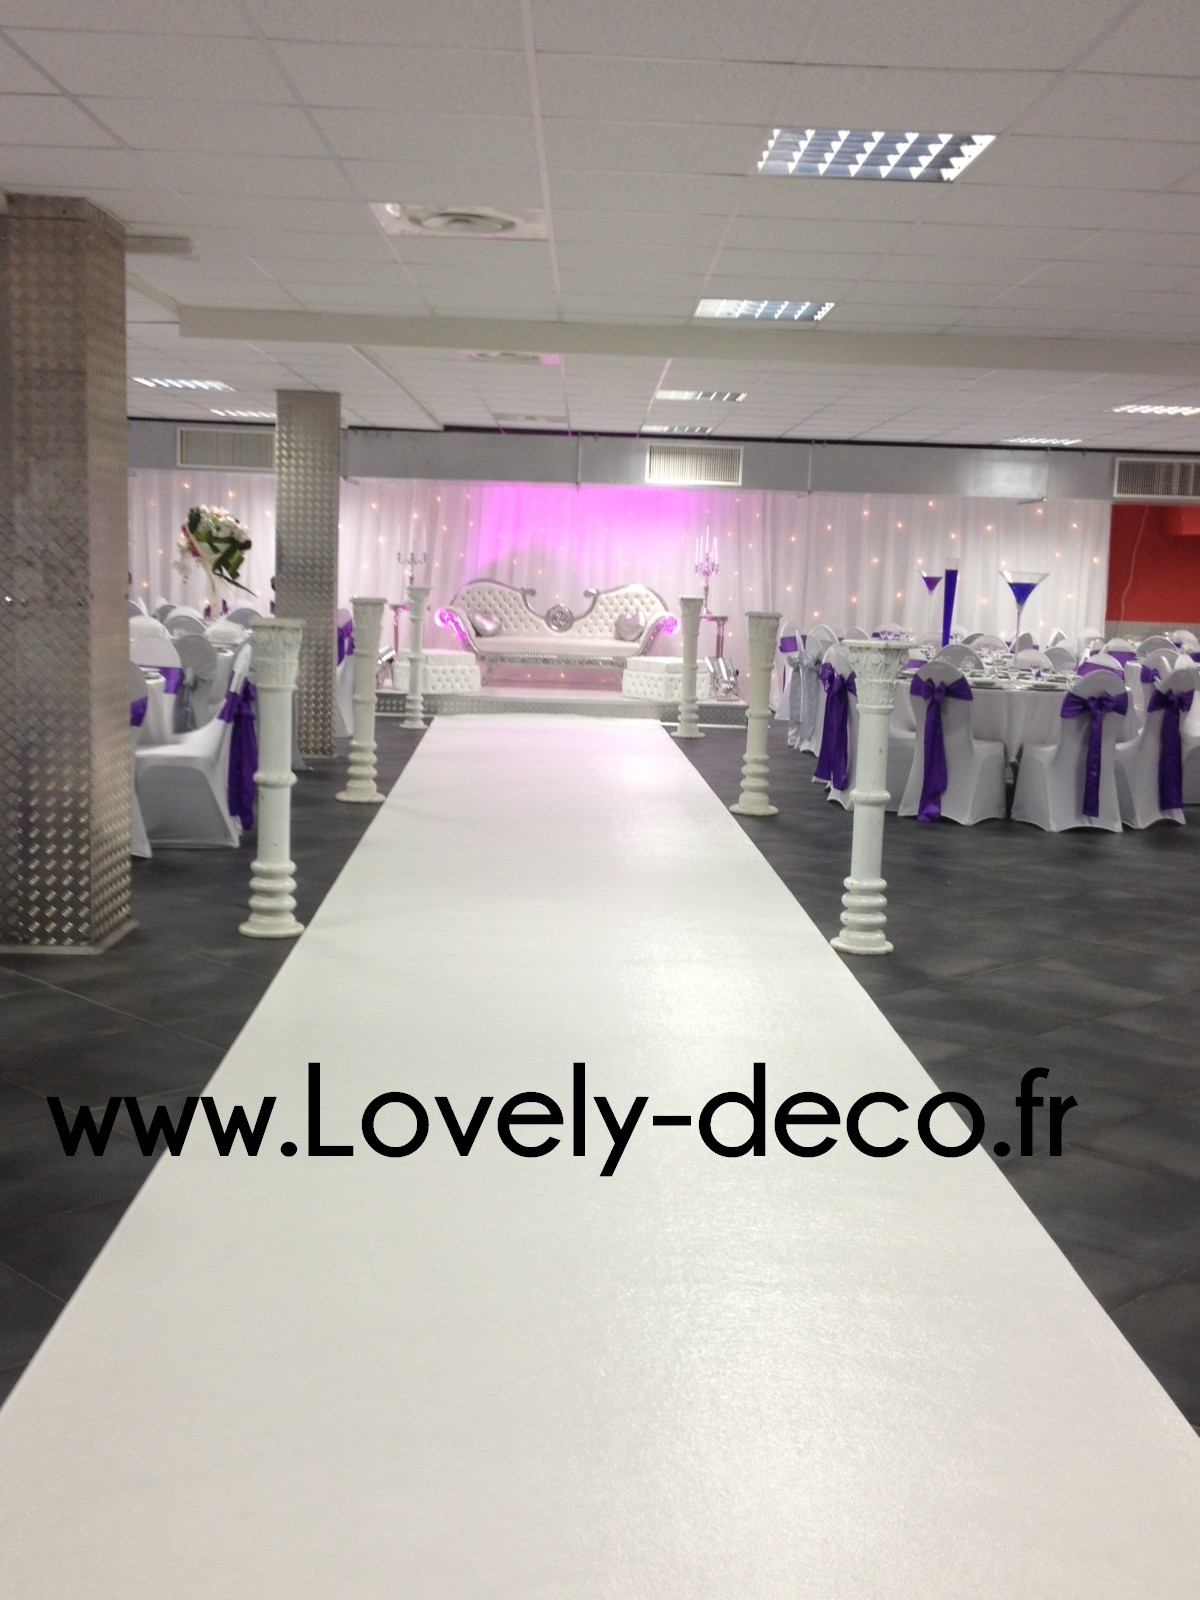 tapis blanc ou tapis rouge pour mariage. Black Bedroom Furniture Sets. Home Design Ideas